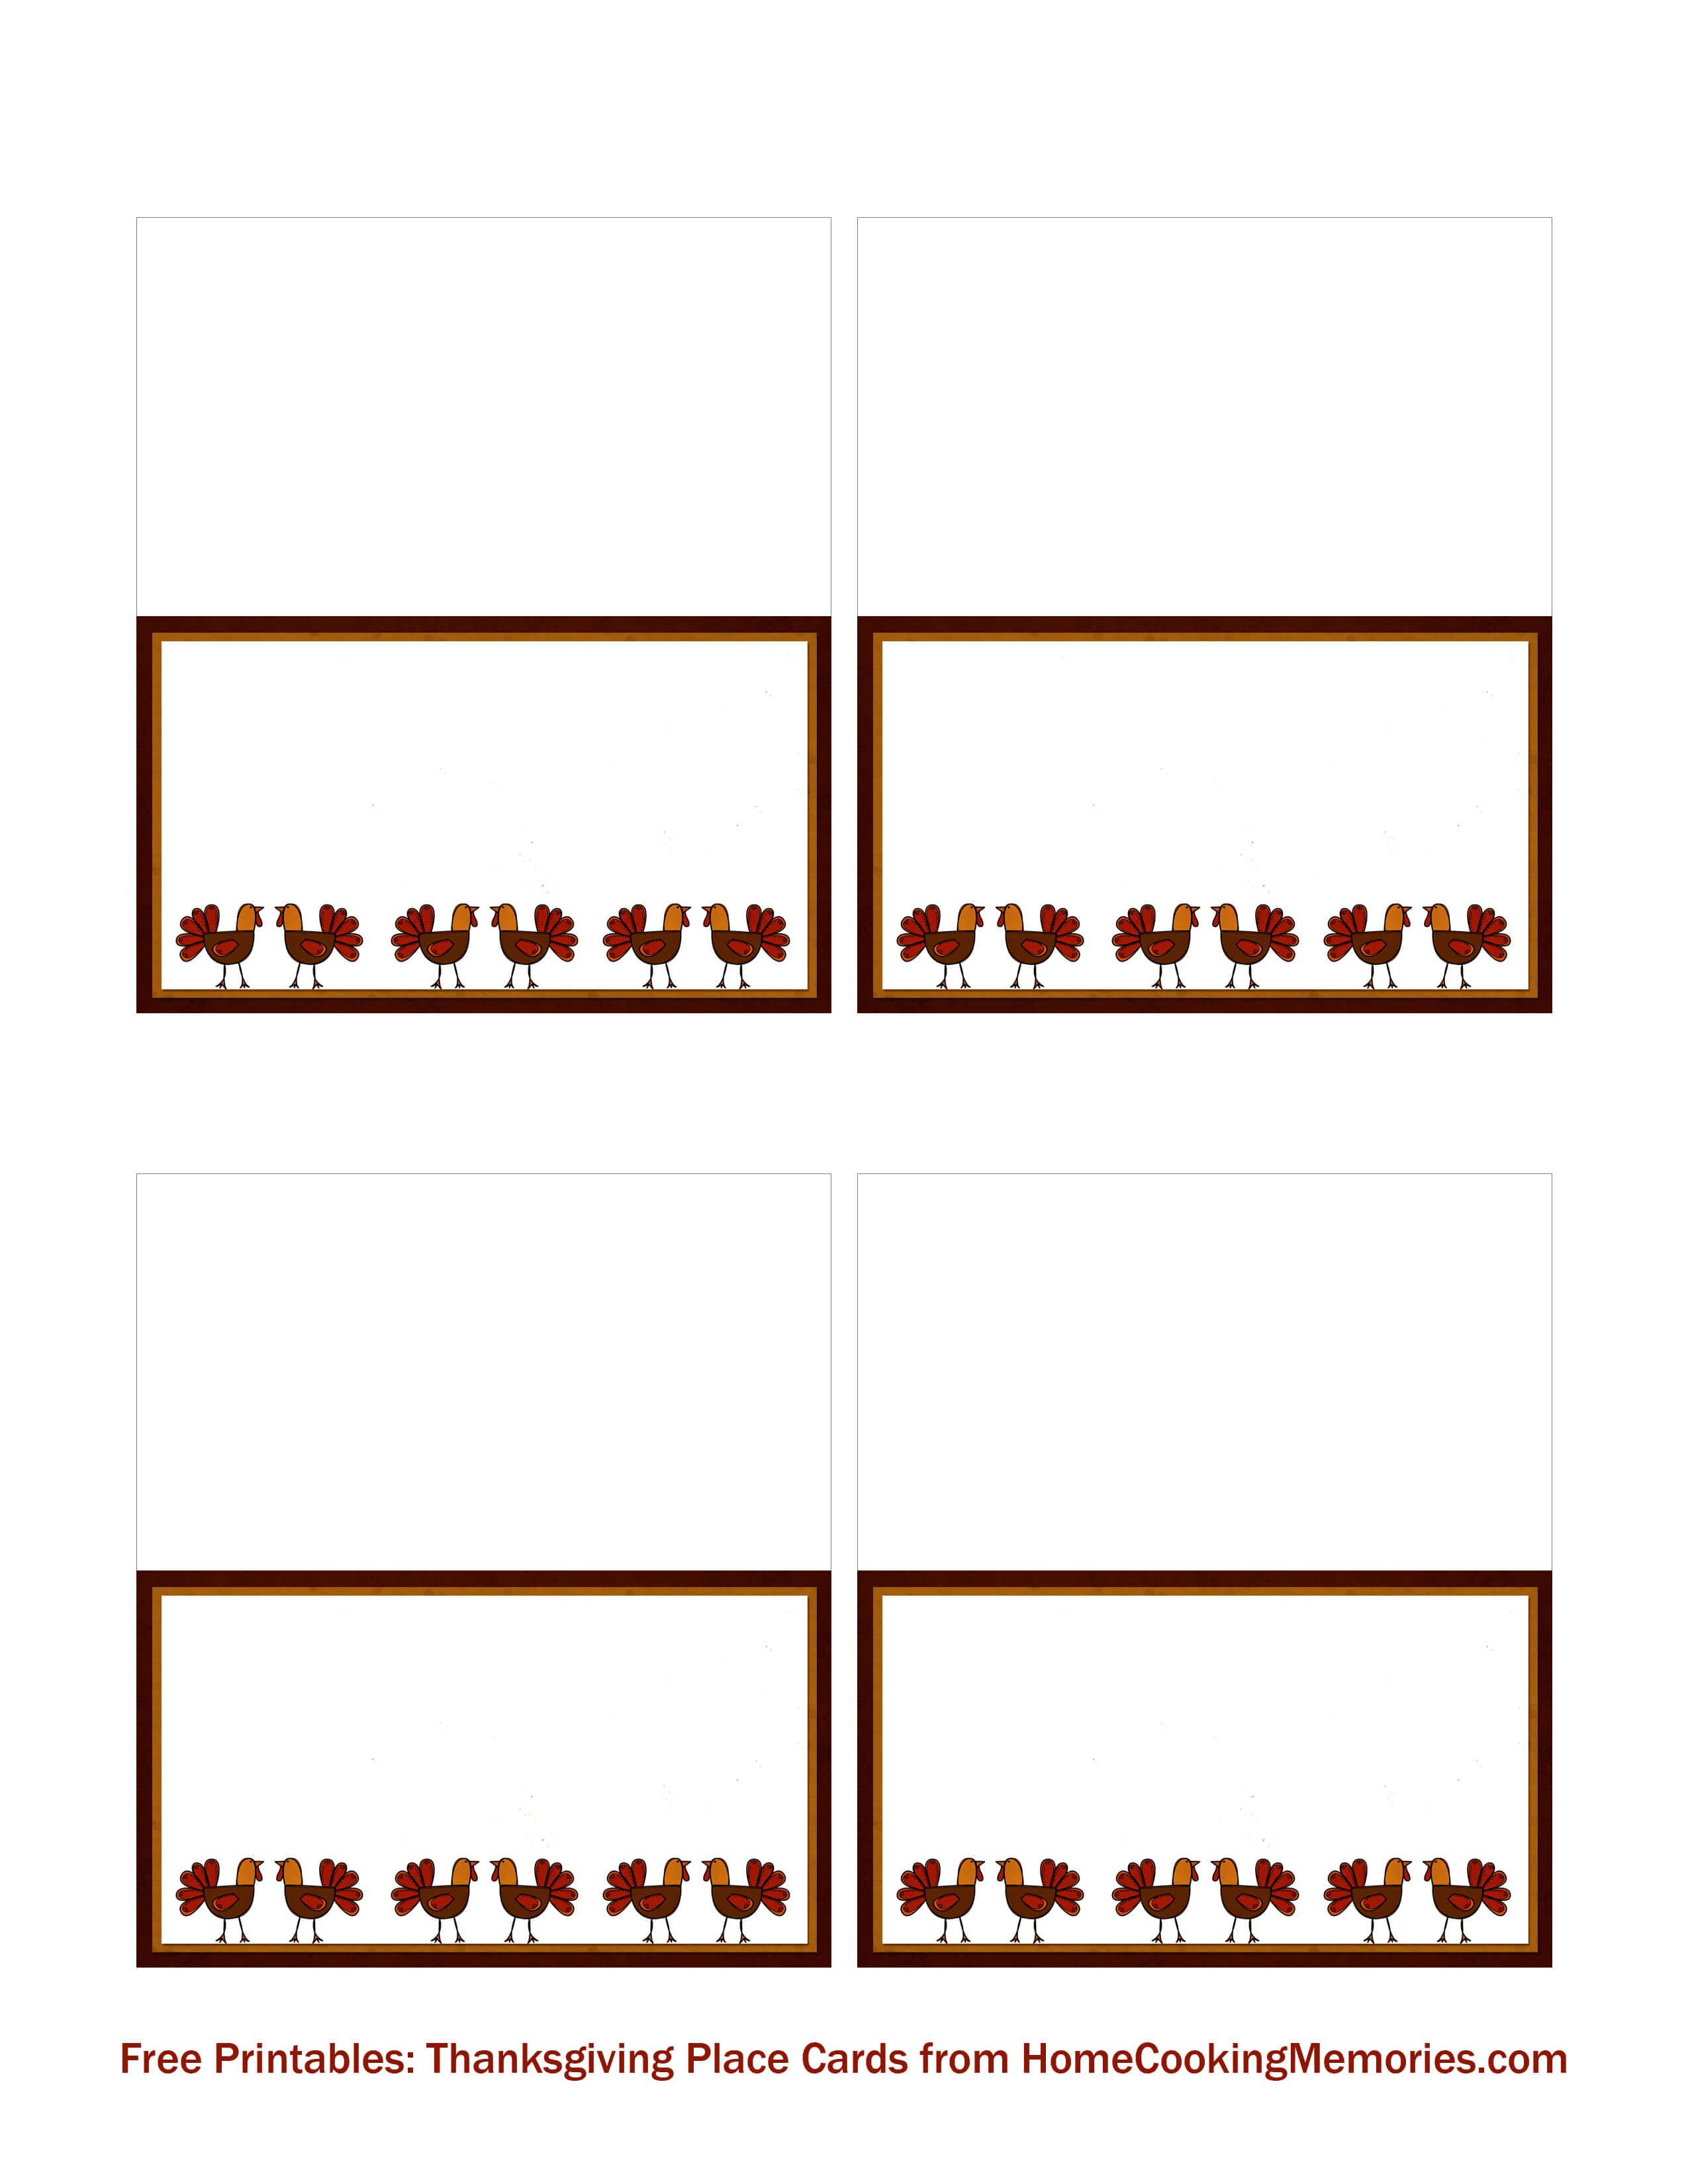 Place Card Template 6 Per Sheet | Meetpaulryan Inside Free Template For Place Cards 6 Per Sheet